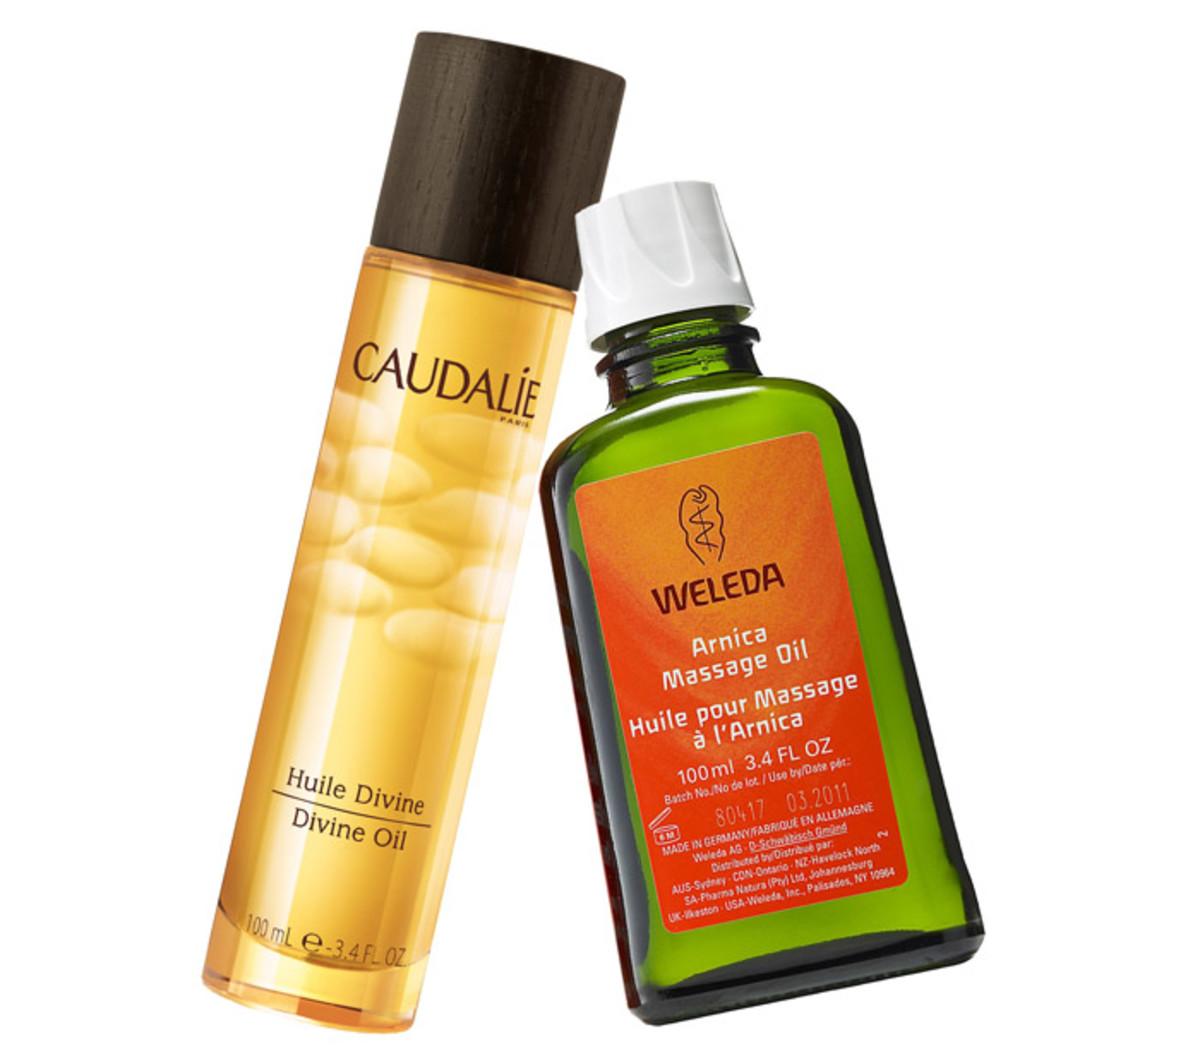 Caudalie Divine Oil_Weleda Arnica Massage Oil